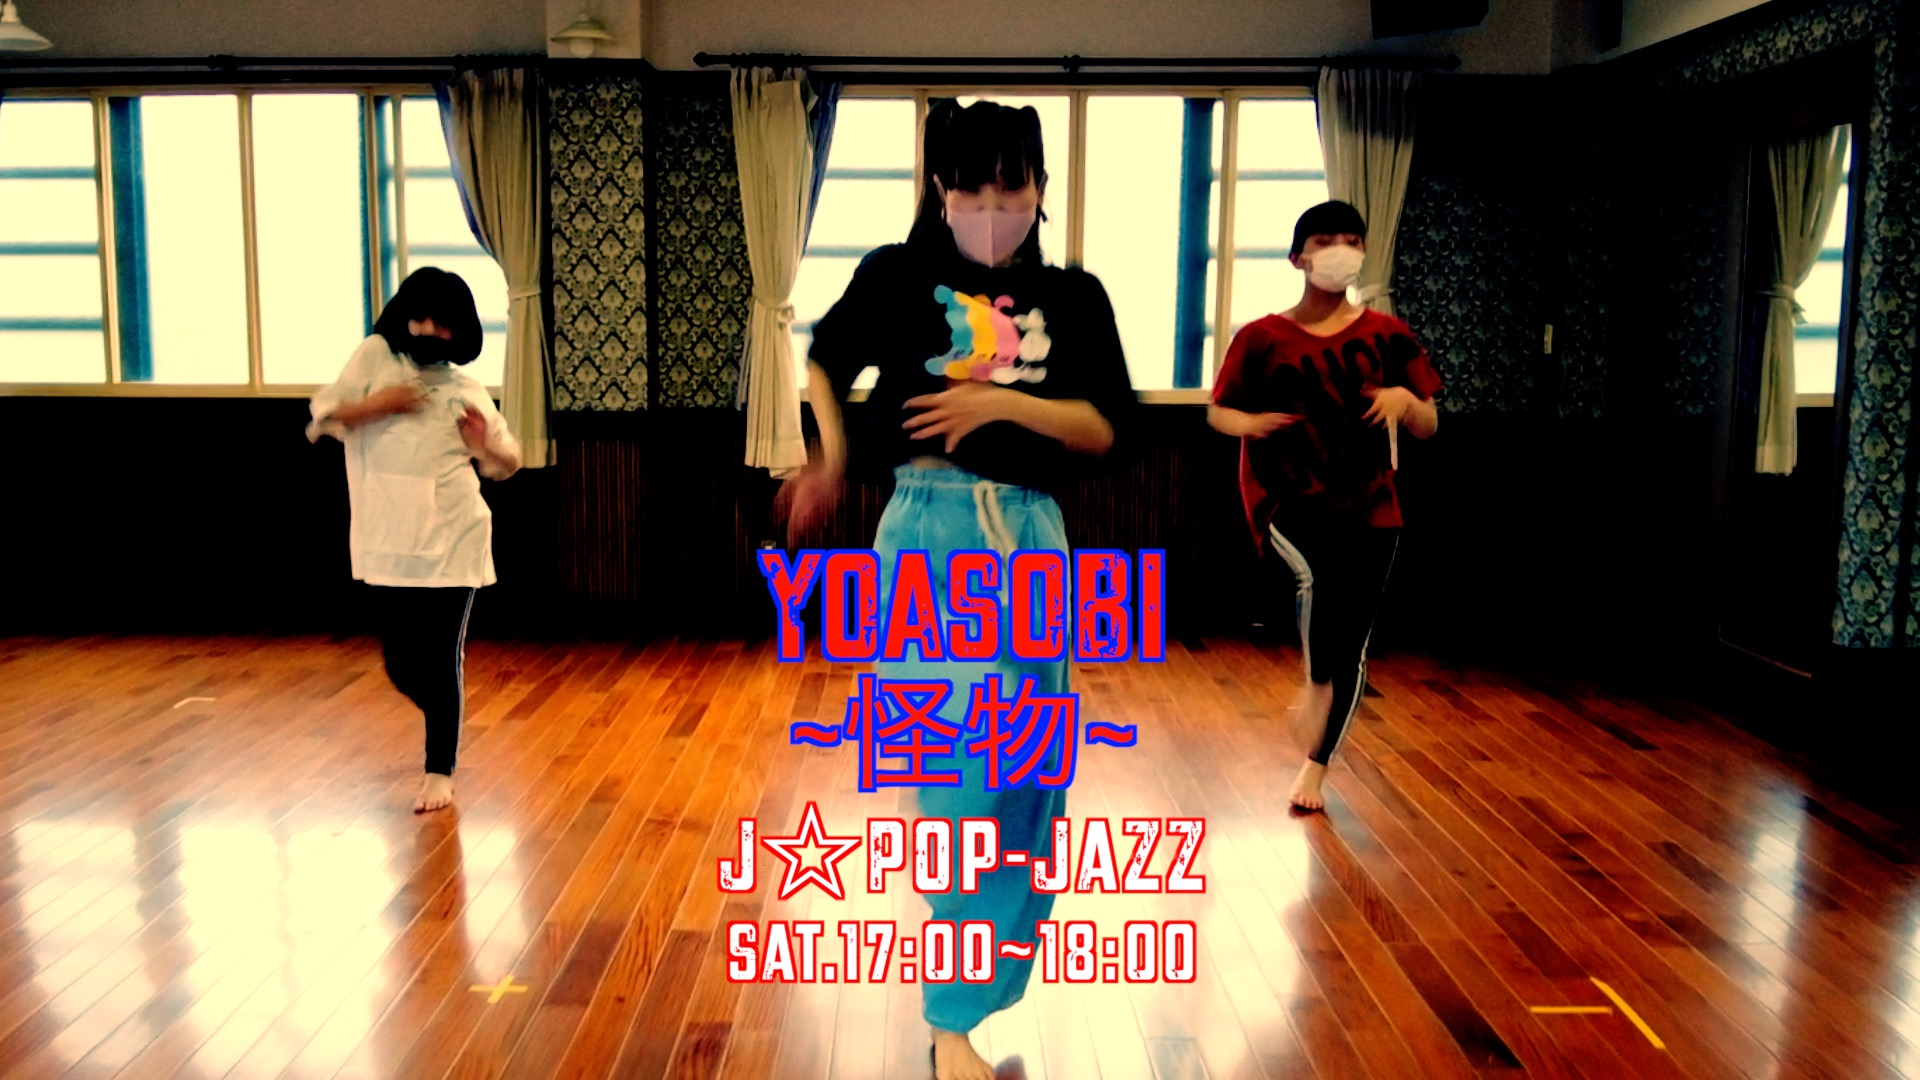 【YOASOBI / 怪物】ジャズダンスで踊ってみた♪